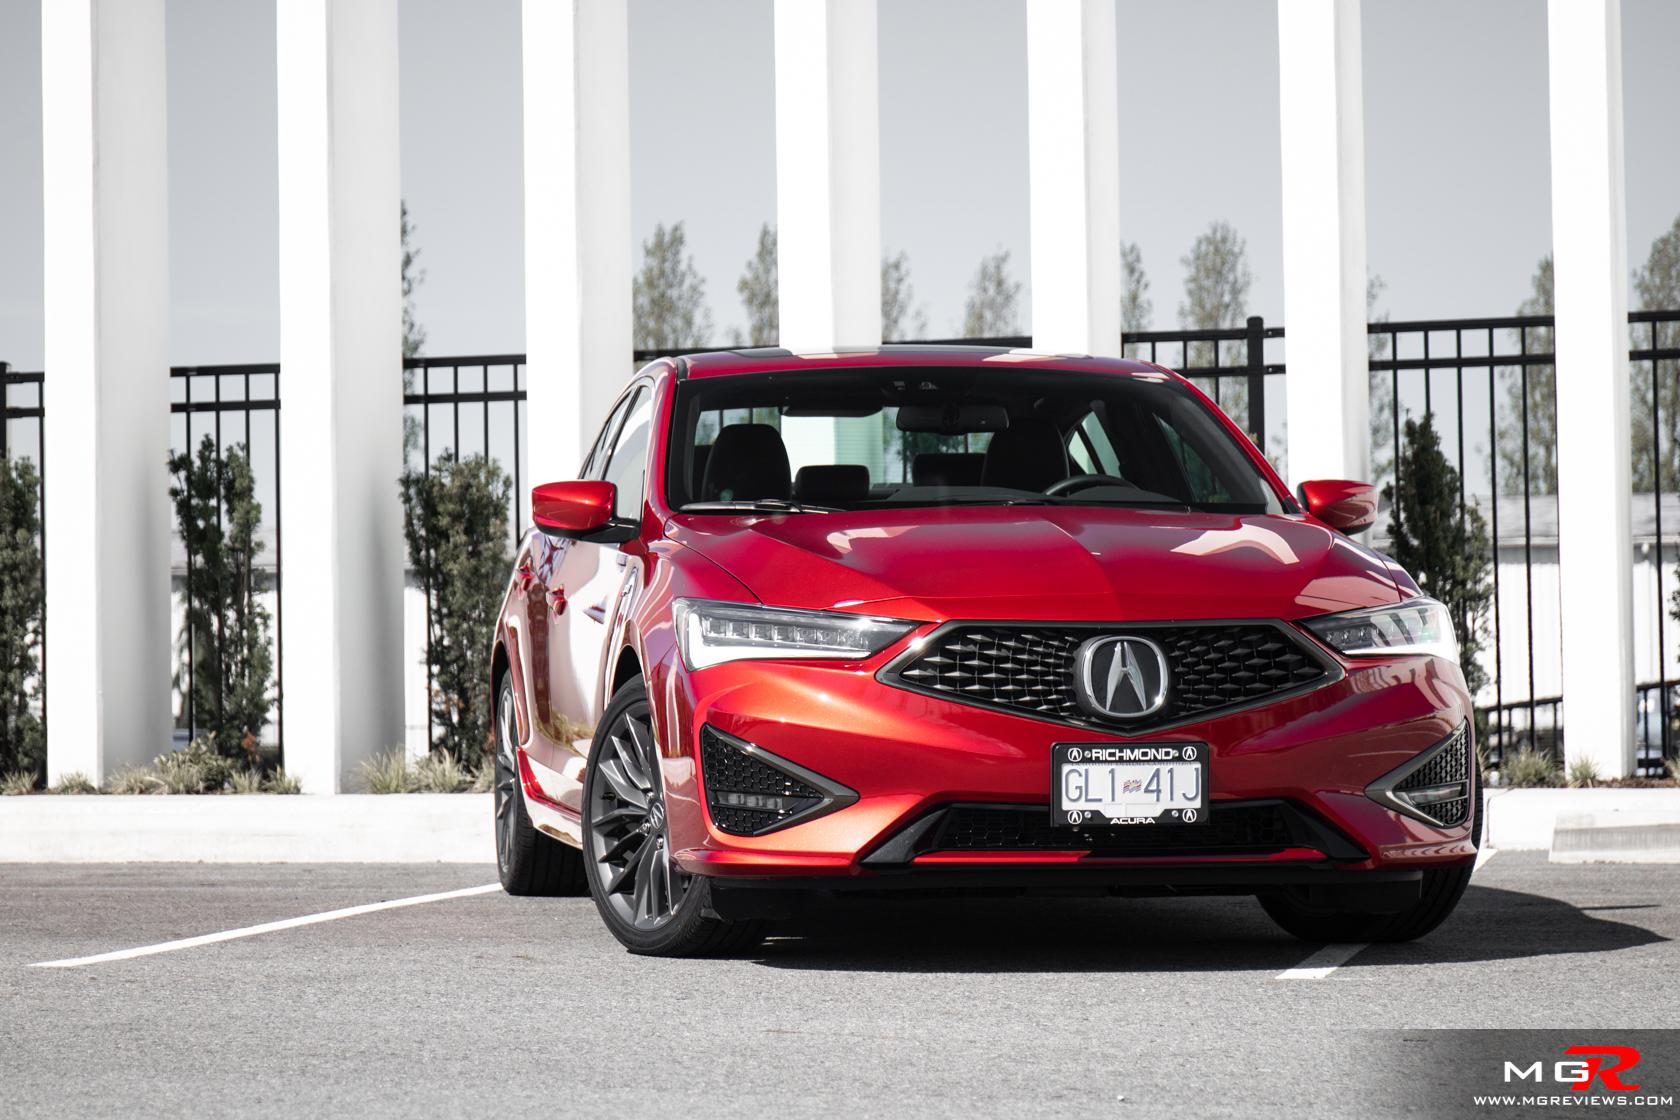 Review: 2019 Acura ILX A-Spec